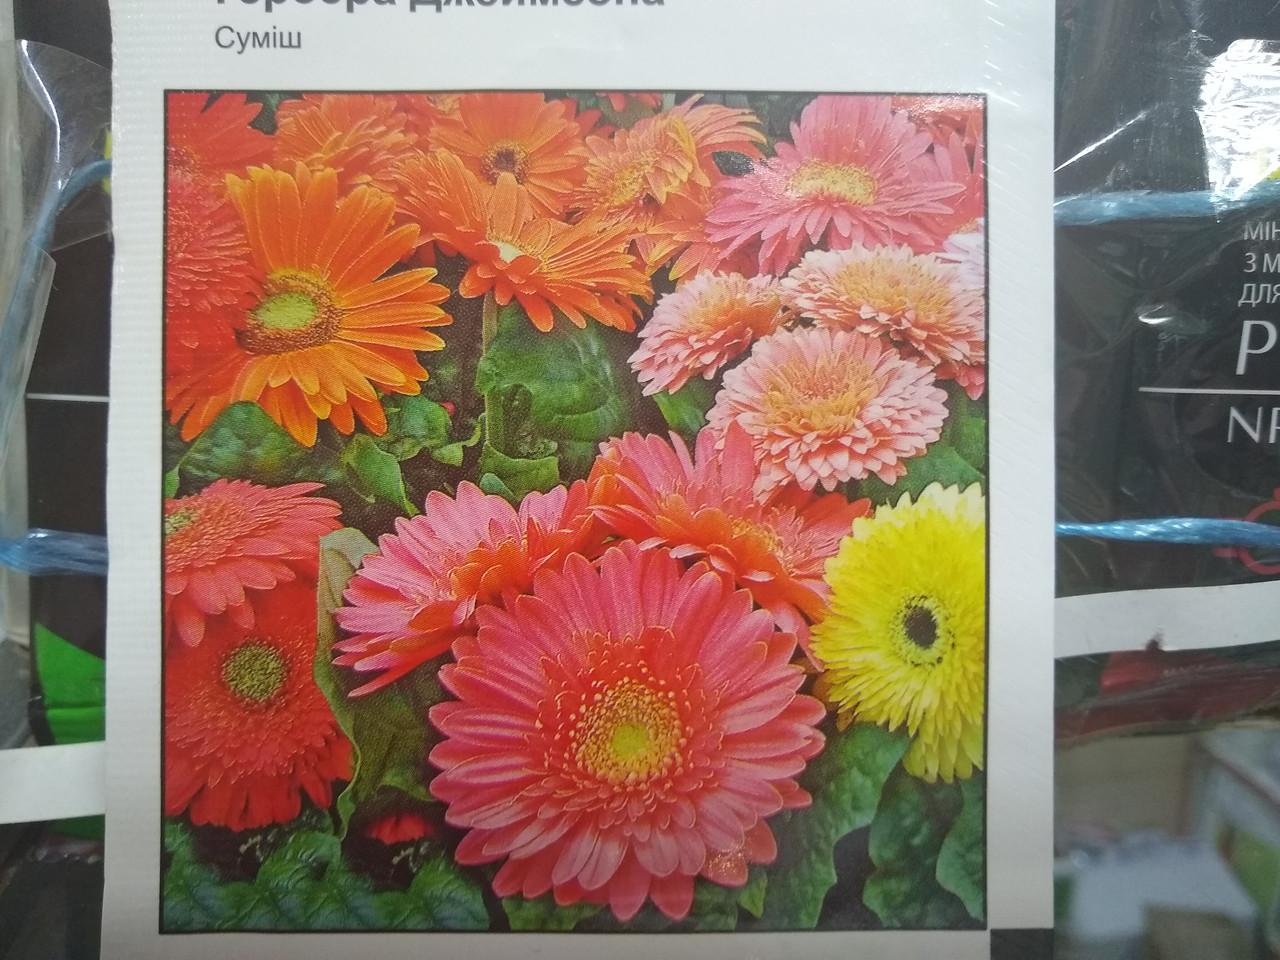 Семена герберы Джеймсона смесь 0,1 грамм семян Хем Заден Нидерланды